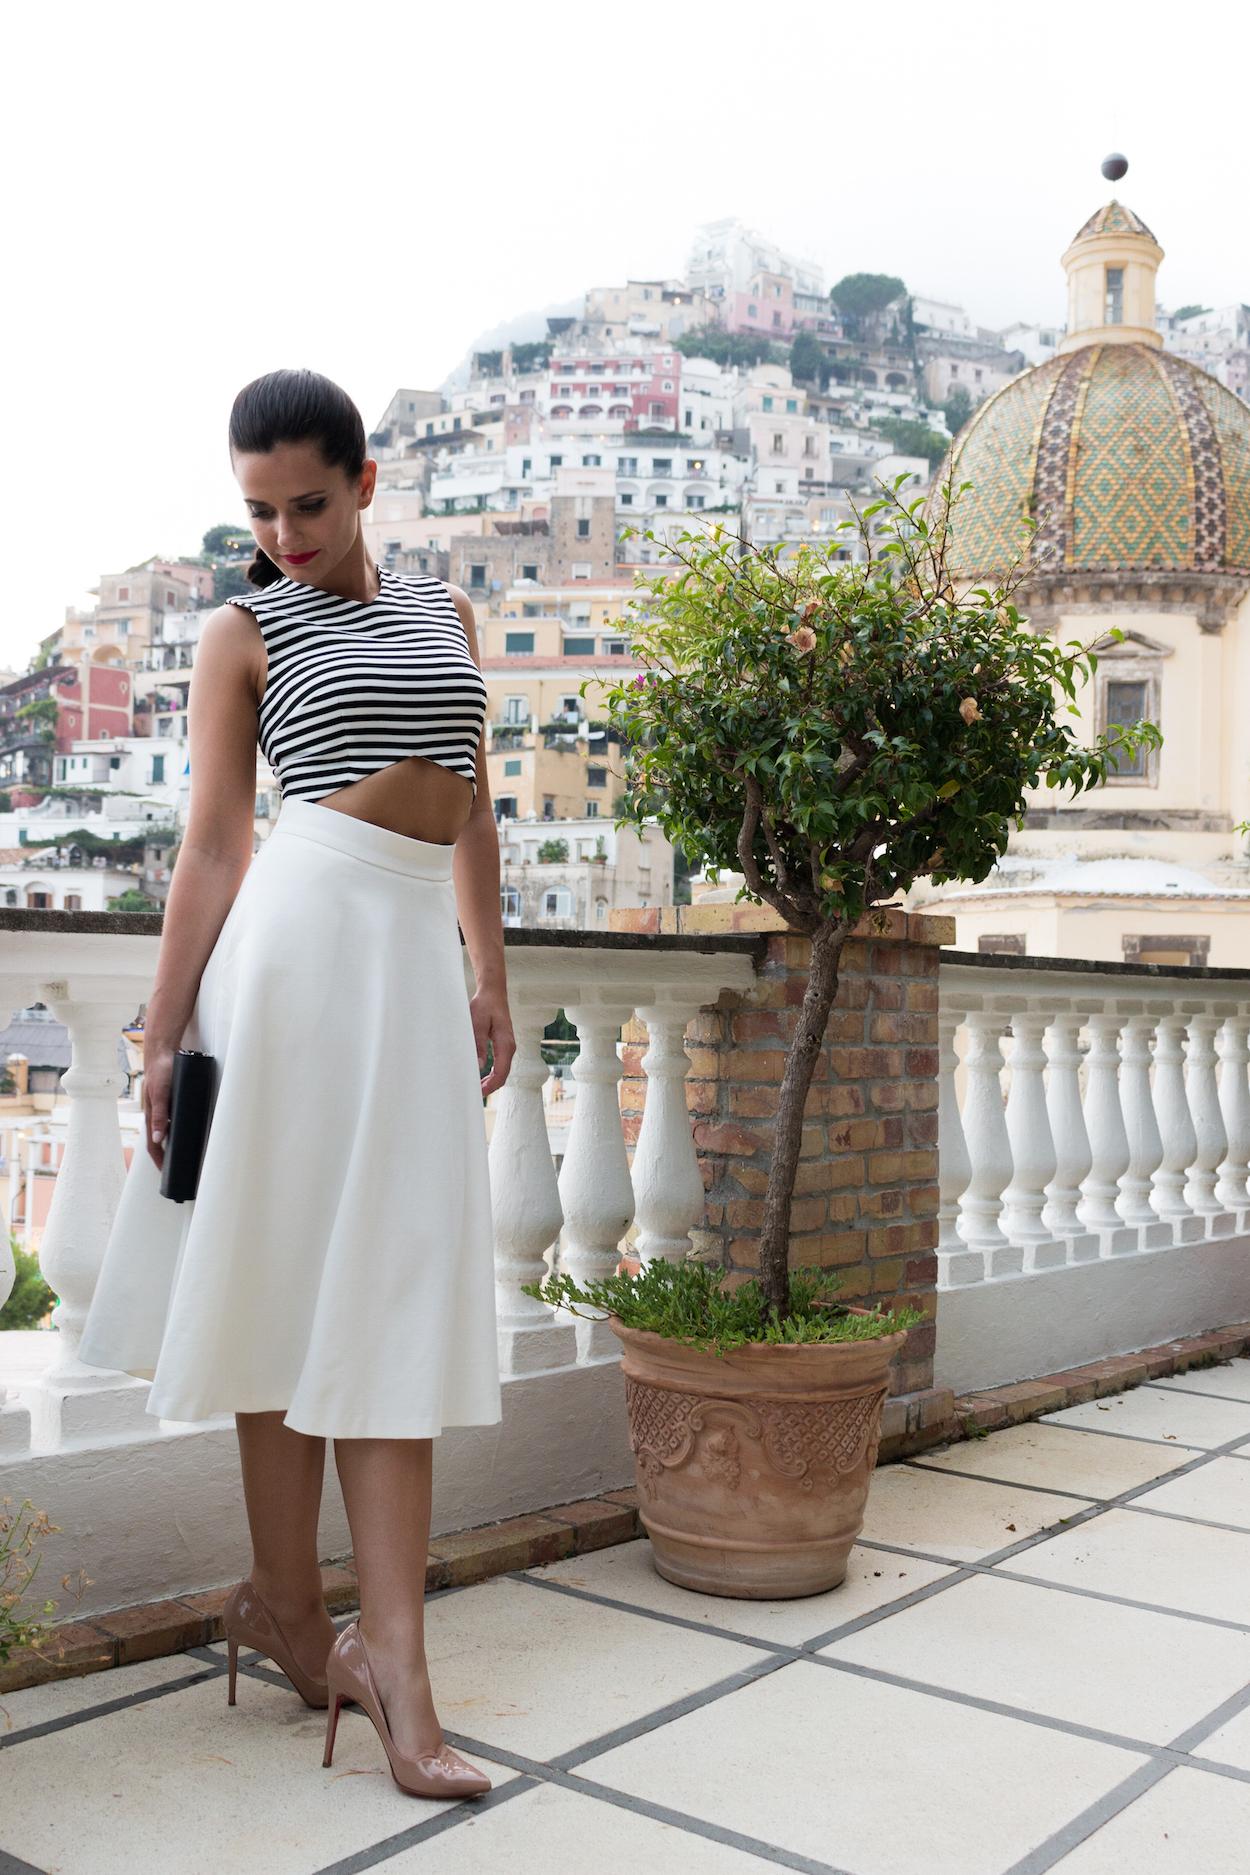 Stripes in Positano | Monde et Mode